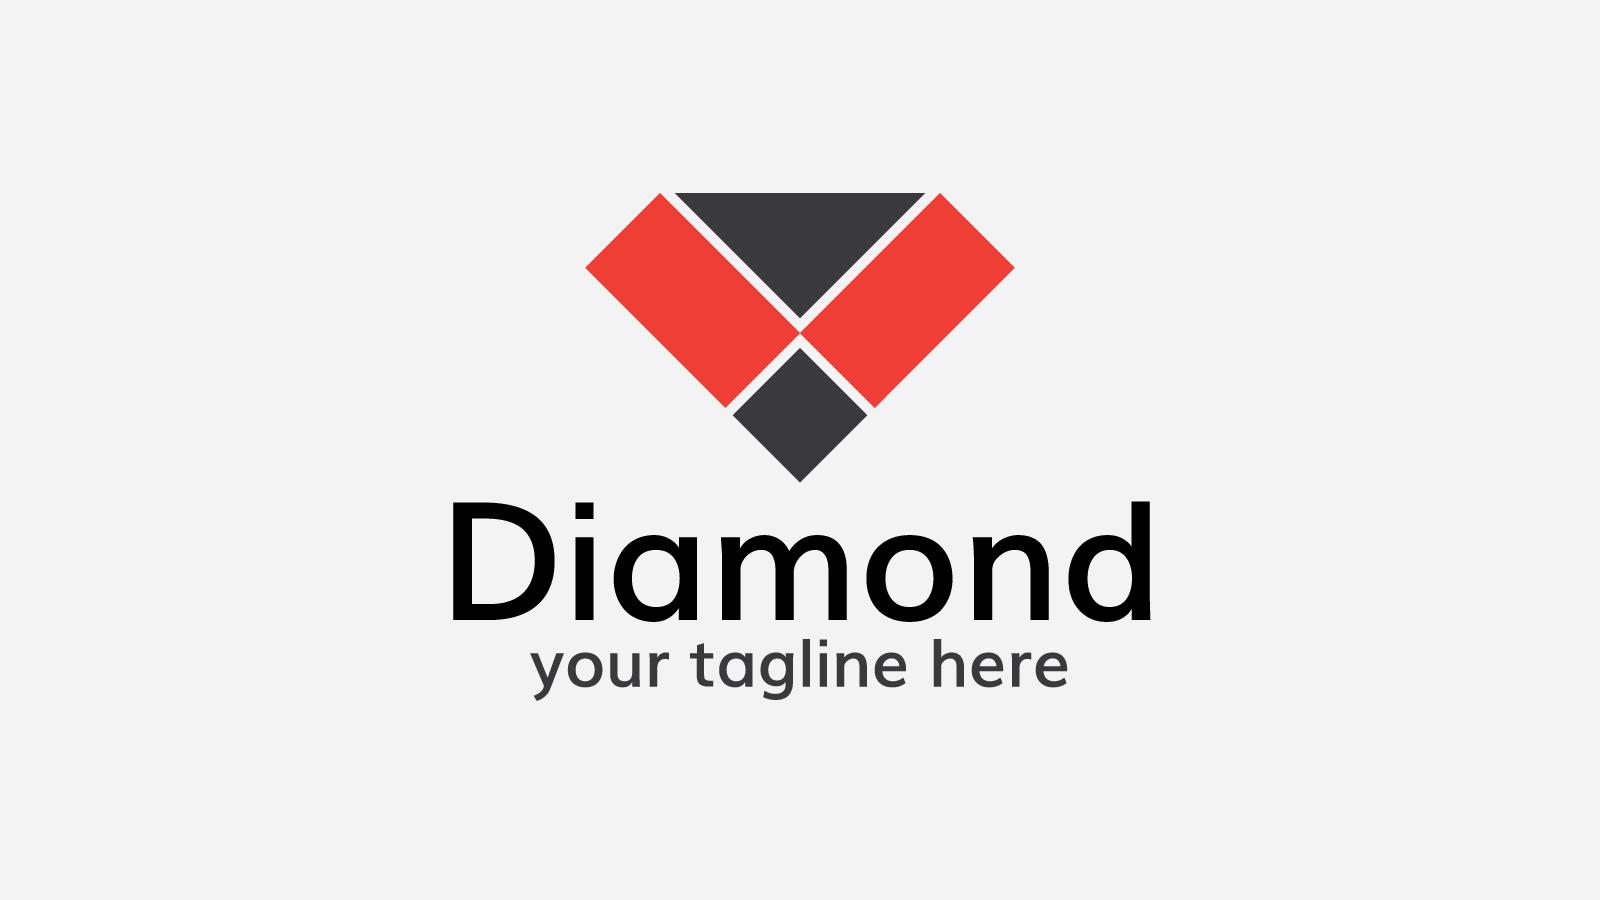 Diamond free logo design   Zfreegraphic: Free vector logo ...